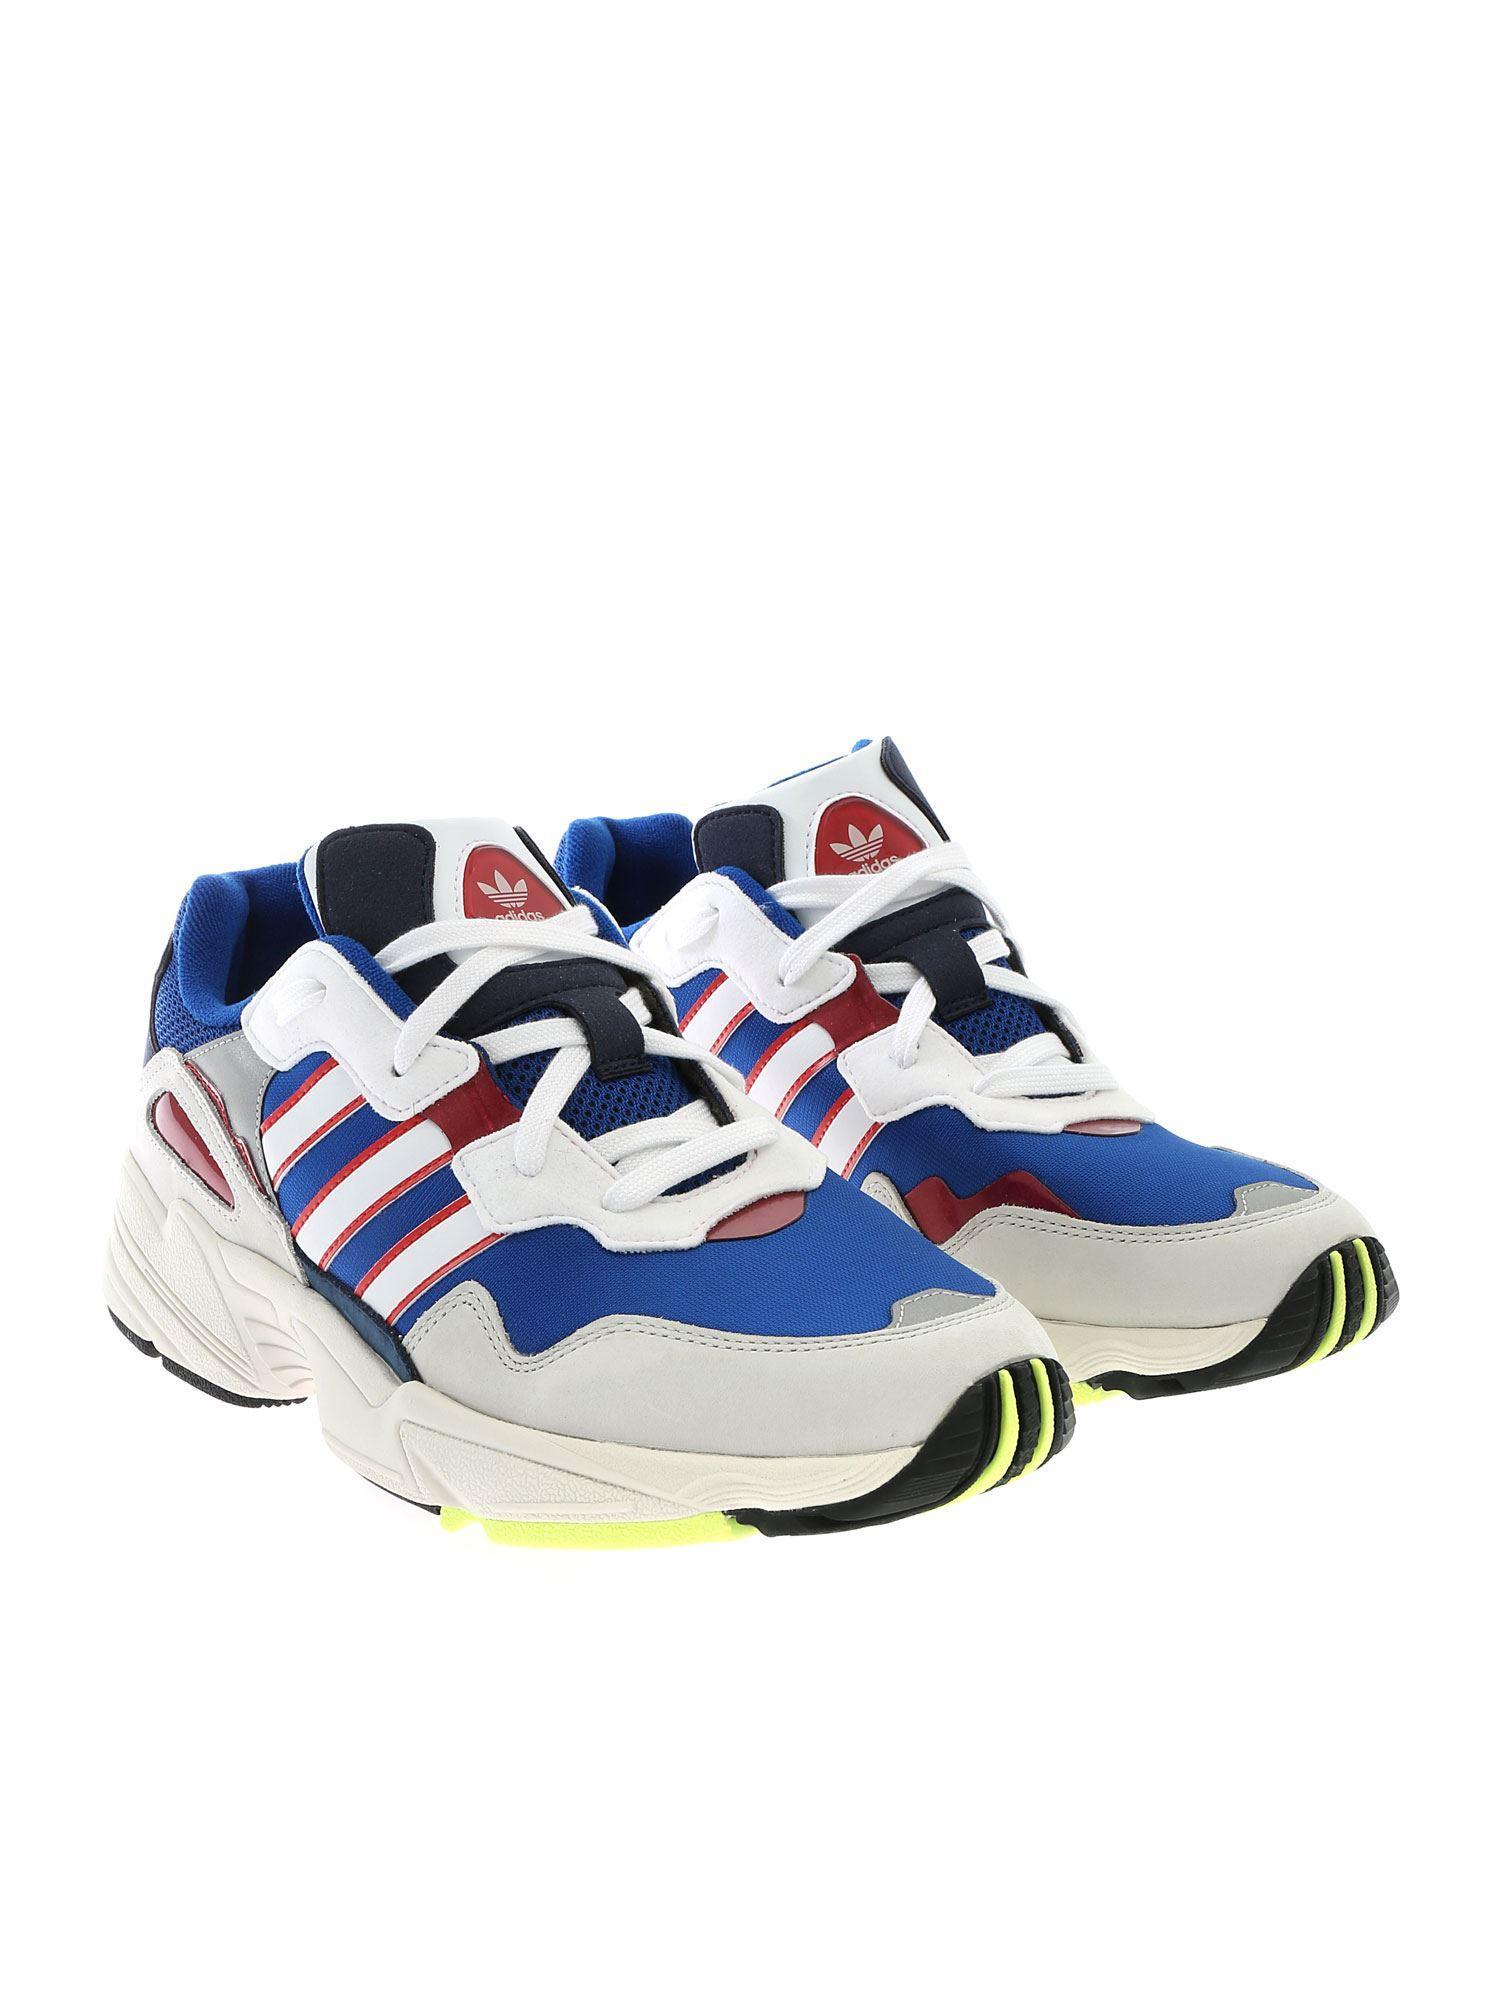 pretty nice 24542 7a785 adidas Originals Yung-96 Ecru And Bluette Sneakers in Blue for Men - Lyst